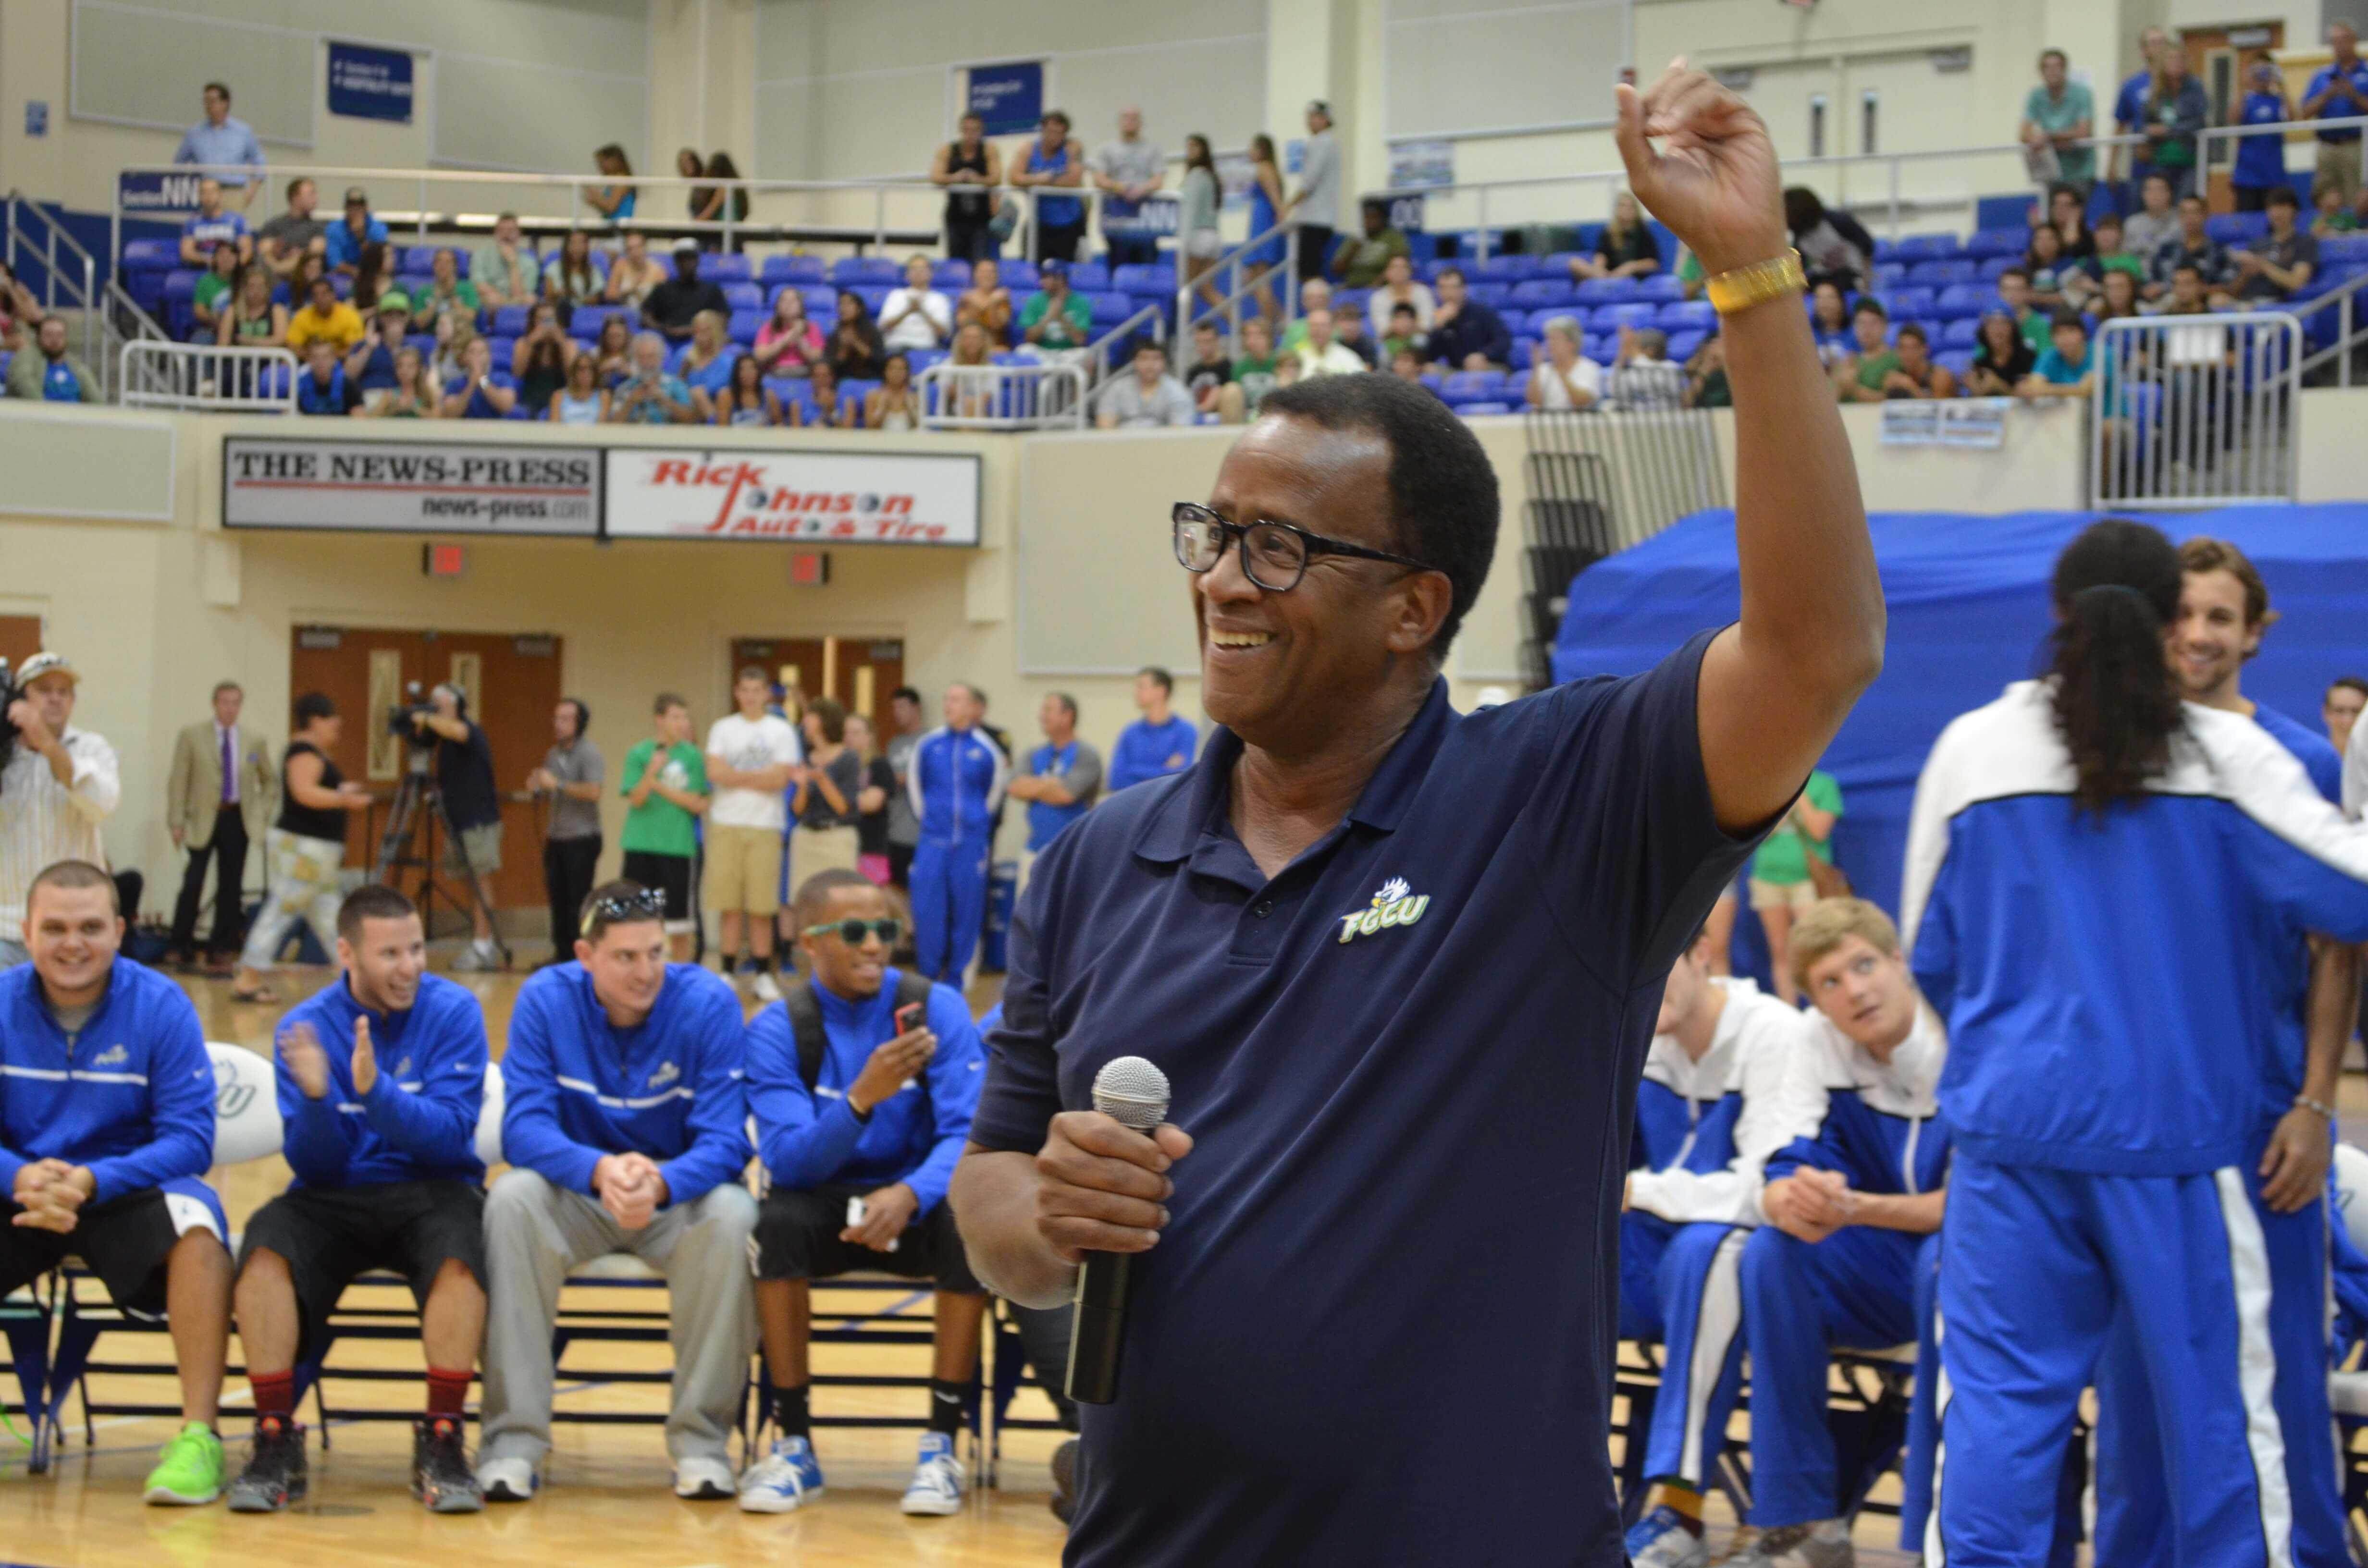 President of Dunk City talks basketball